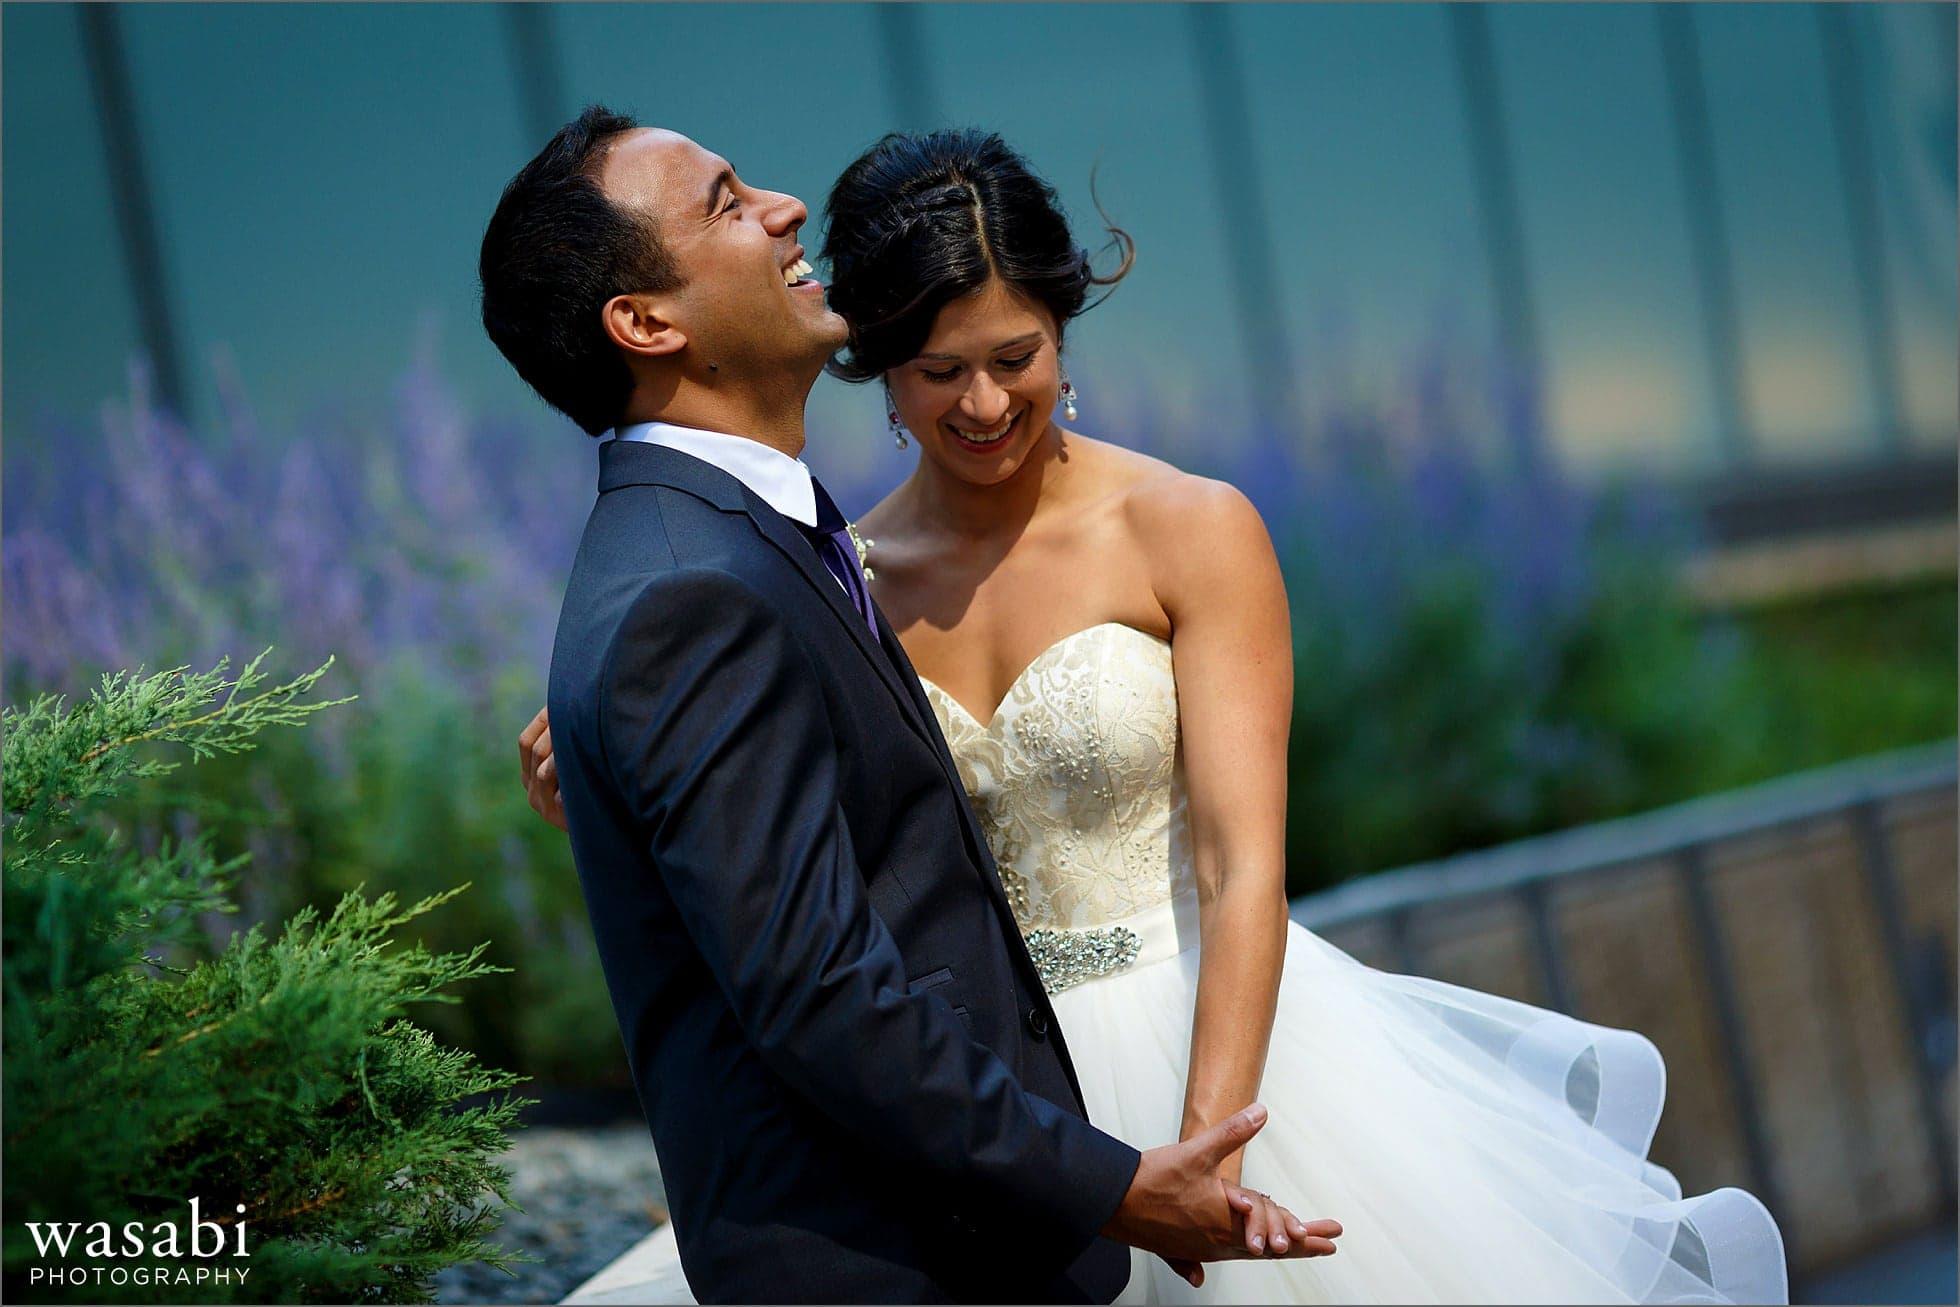 bride and groom laugh outdoor garden wedding portrait